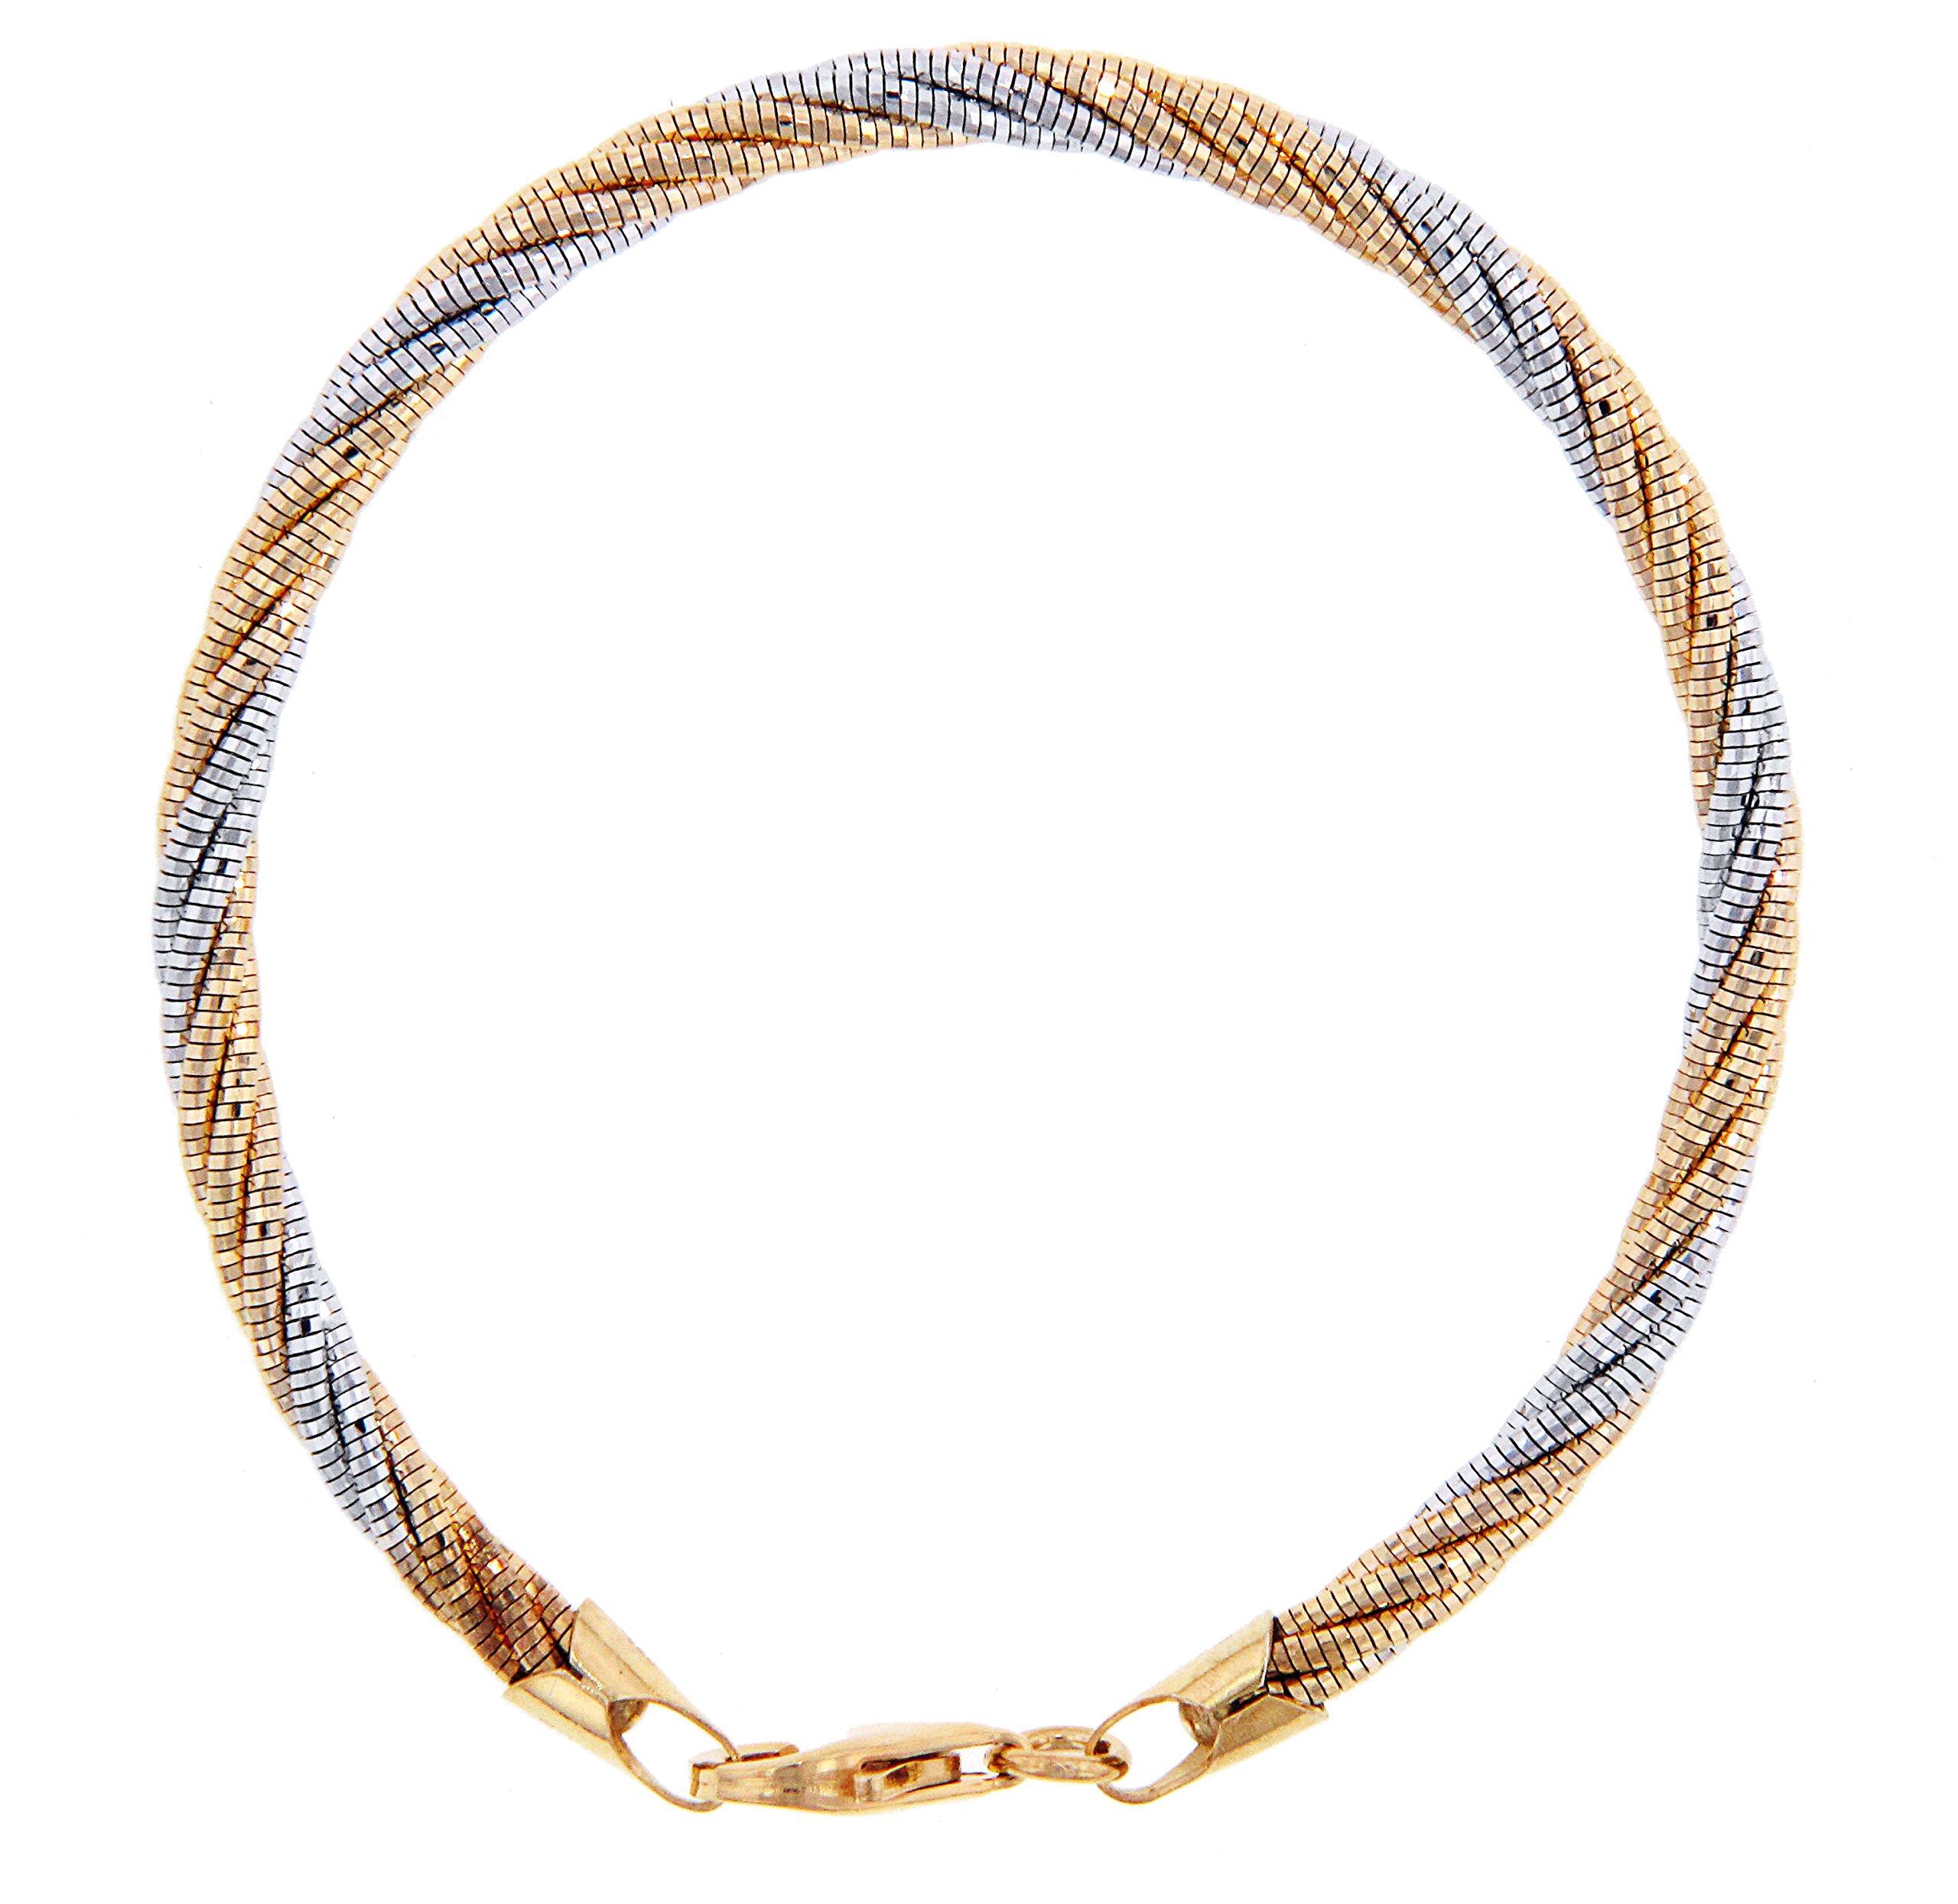 Officina Bernardi Sterling Silver Two-Tone 5 Row Spring Bracelet (7) by Officina Bernardi